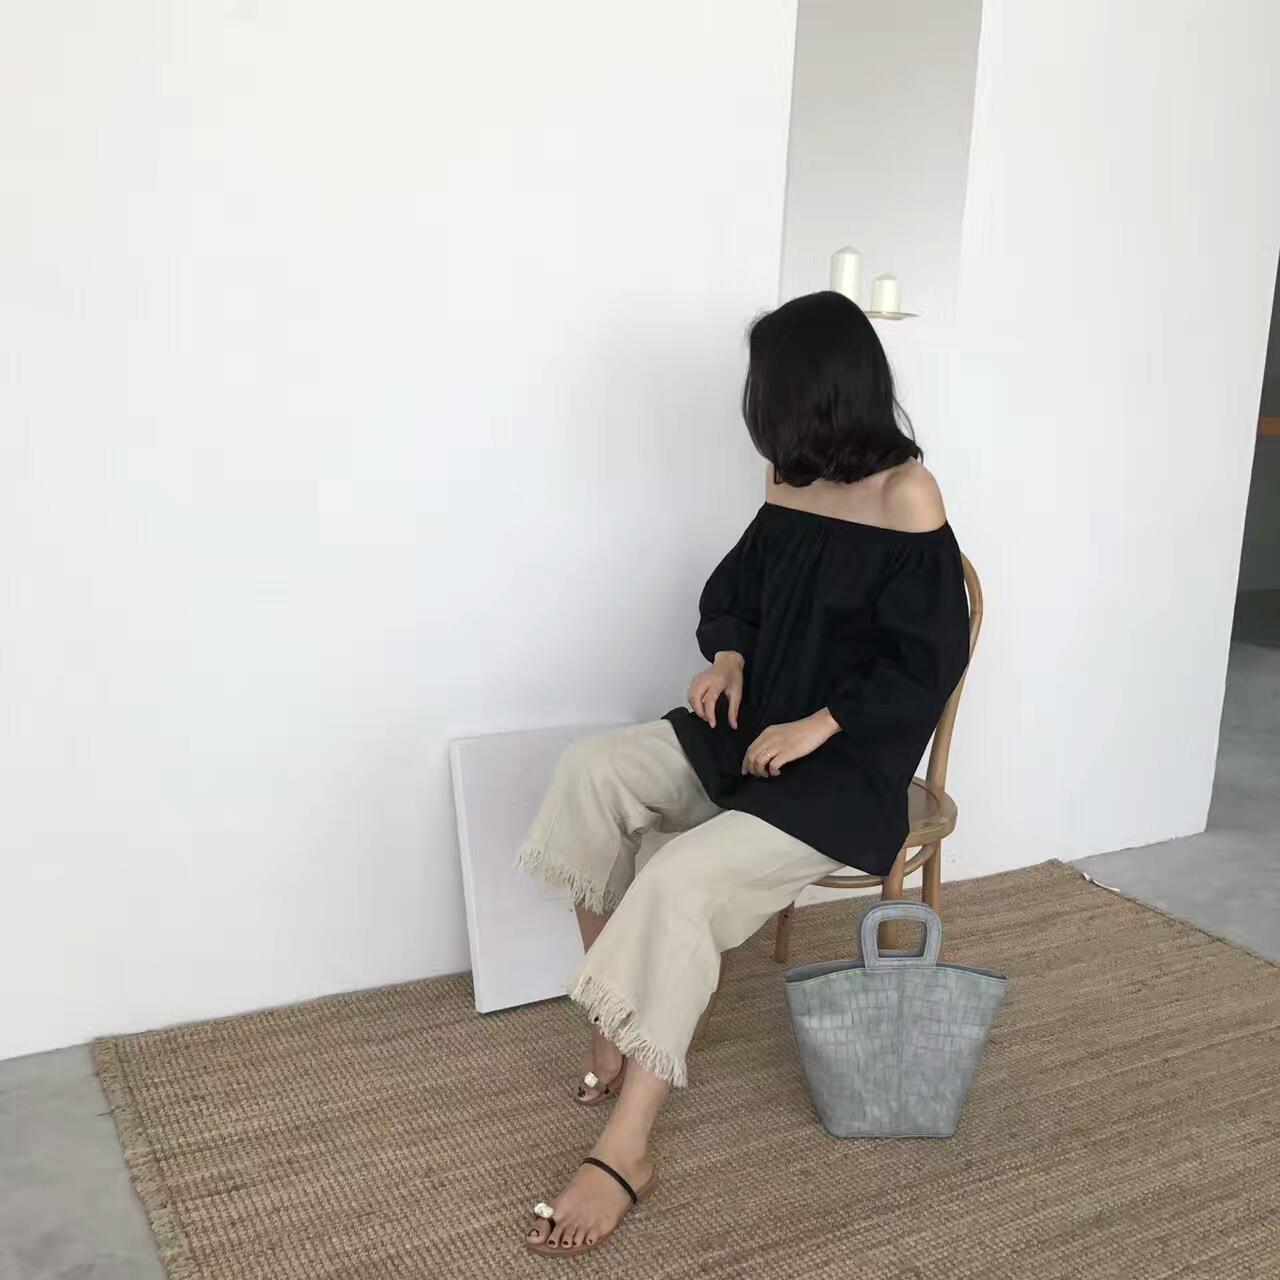 Crocodile Women Bag Big Luxury Elegant Top Handle Bags Brand Women Designer Handbags Female Bag